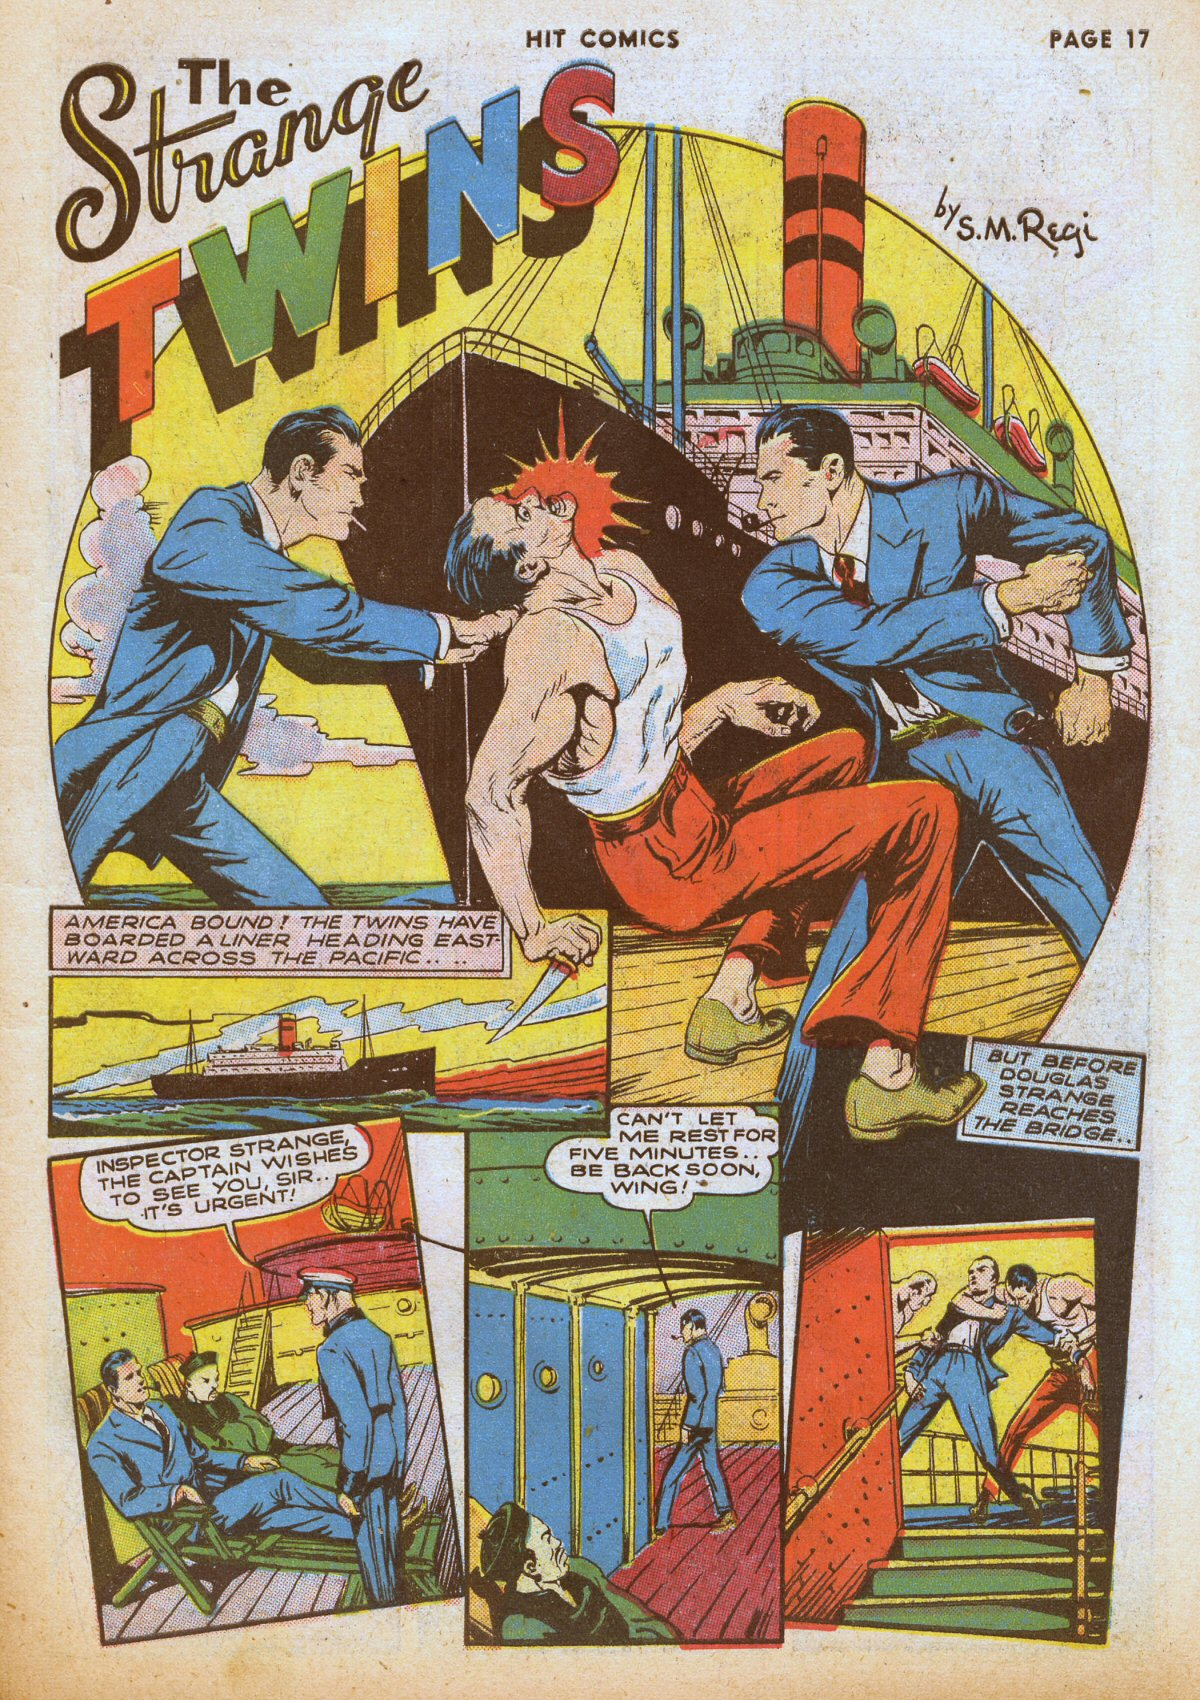 Read online Hit Comics comic -  Issue #12 - 19